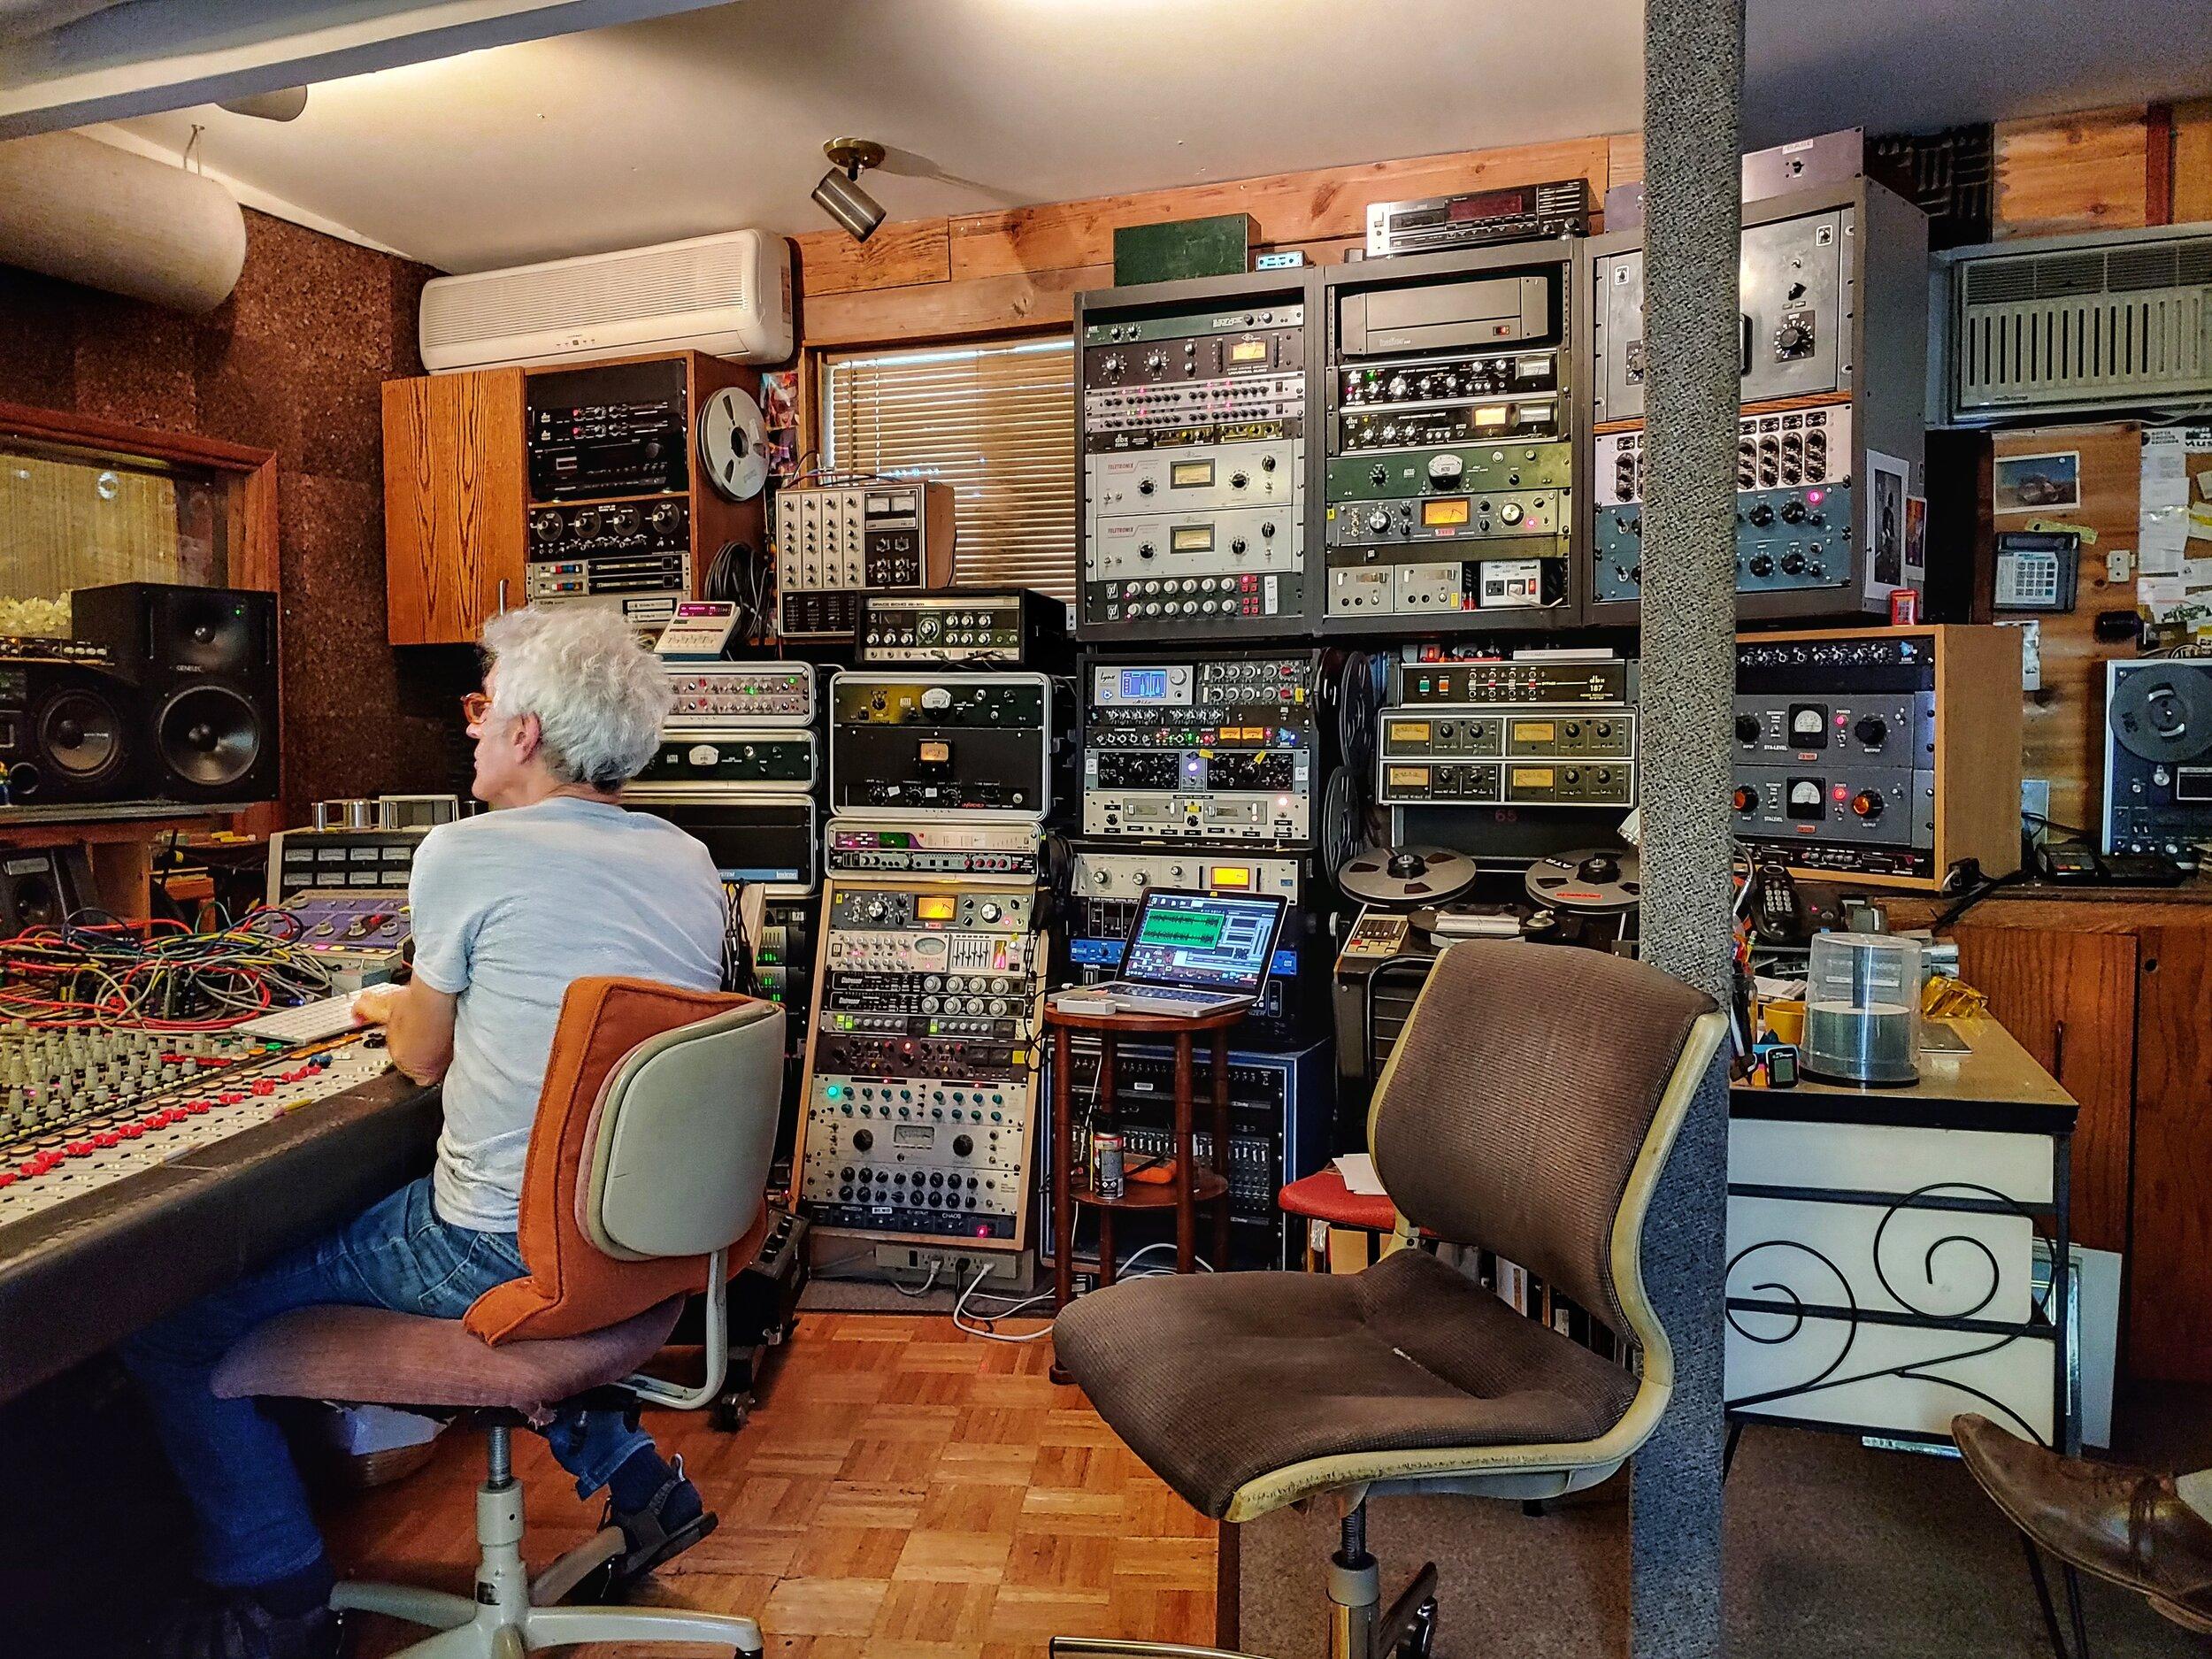 widespread-haze-at-gung-ho-studio-billy